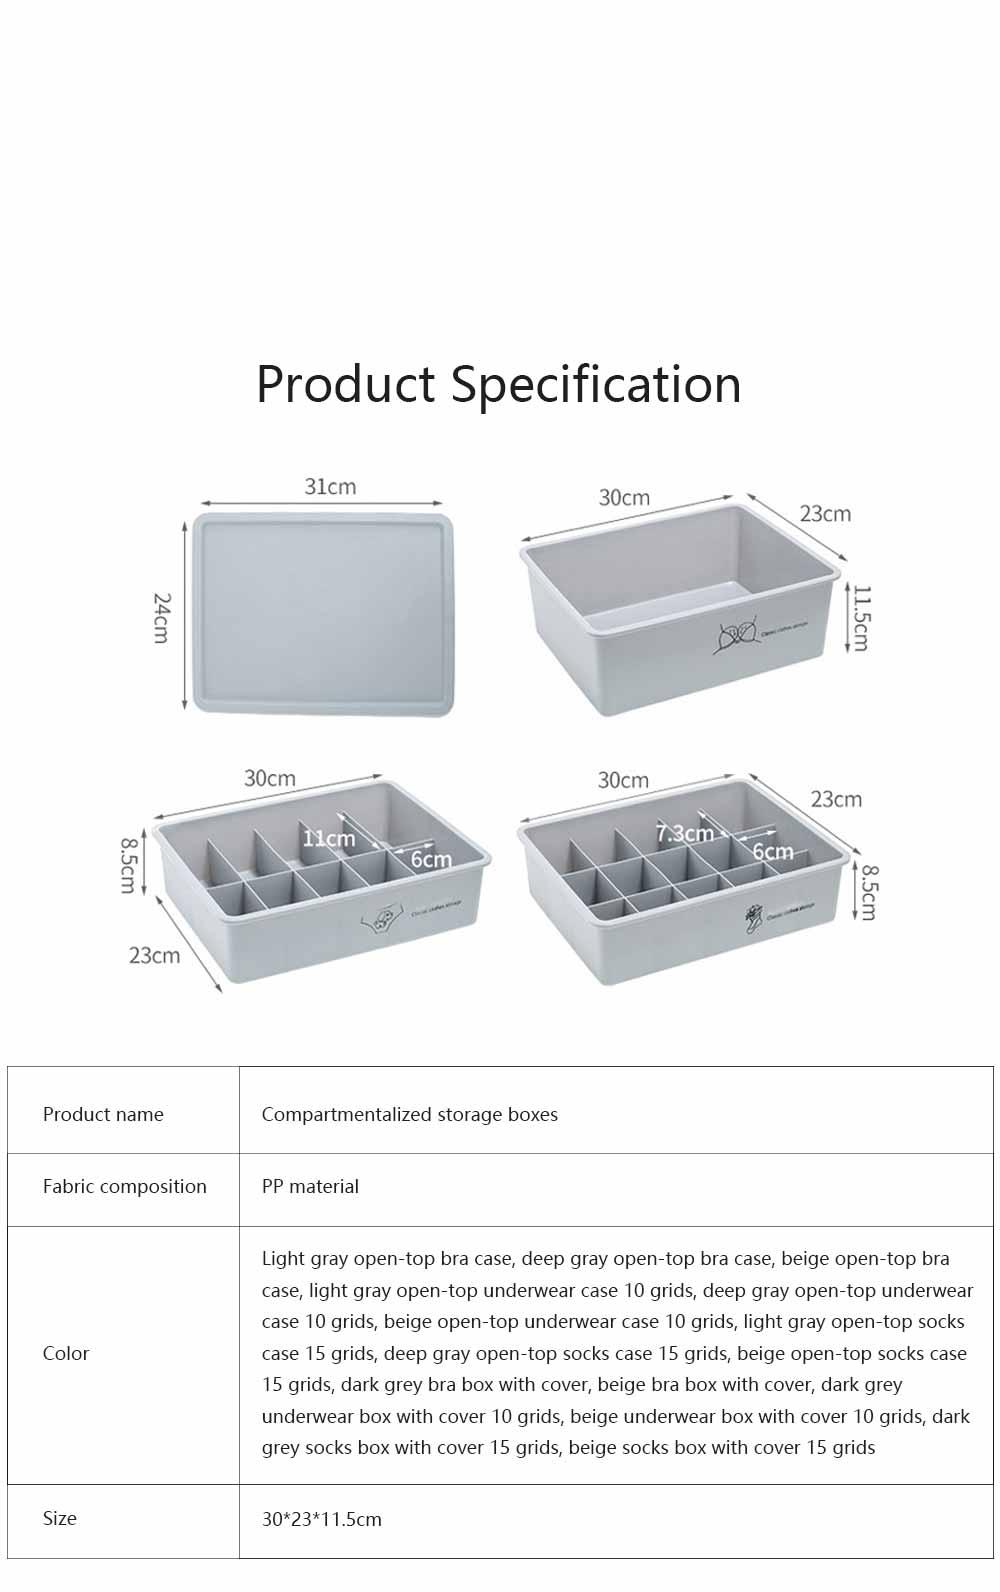 Compartmentalized Storage Boxes Higher Bottom Sunken Design Concise Style Underwear Bra and Socks Storage Cases 6